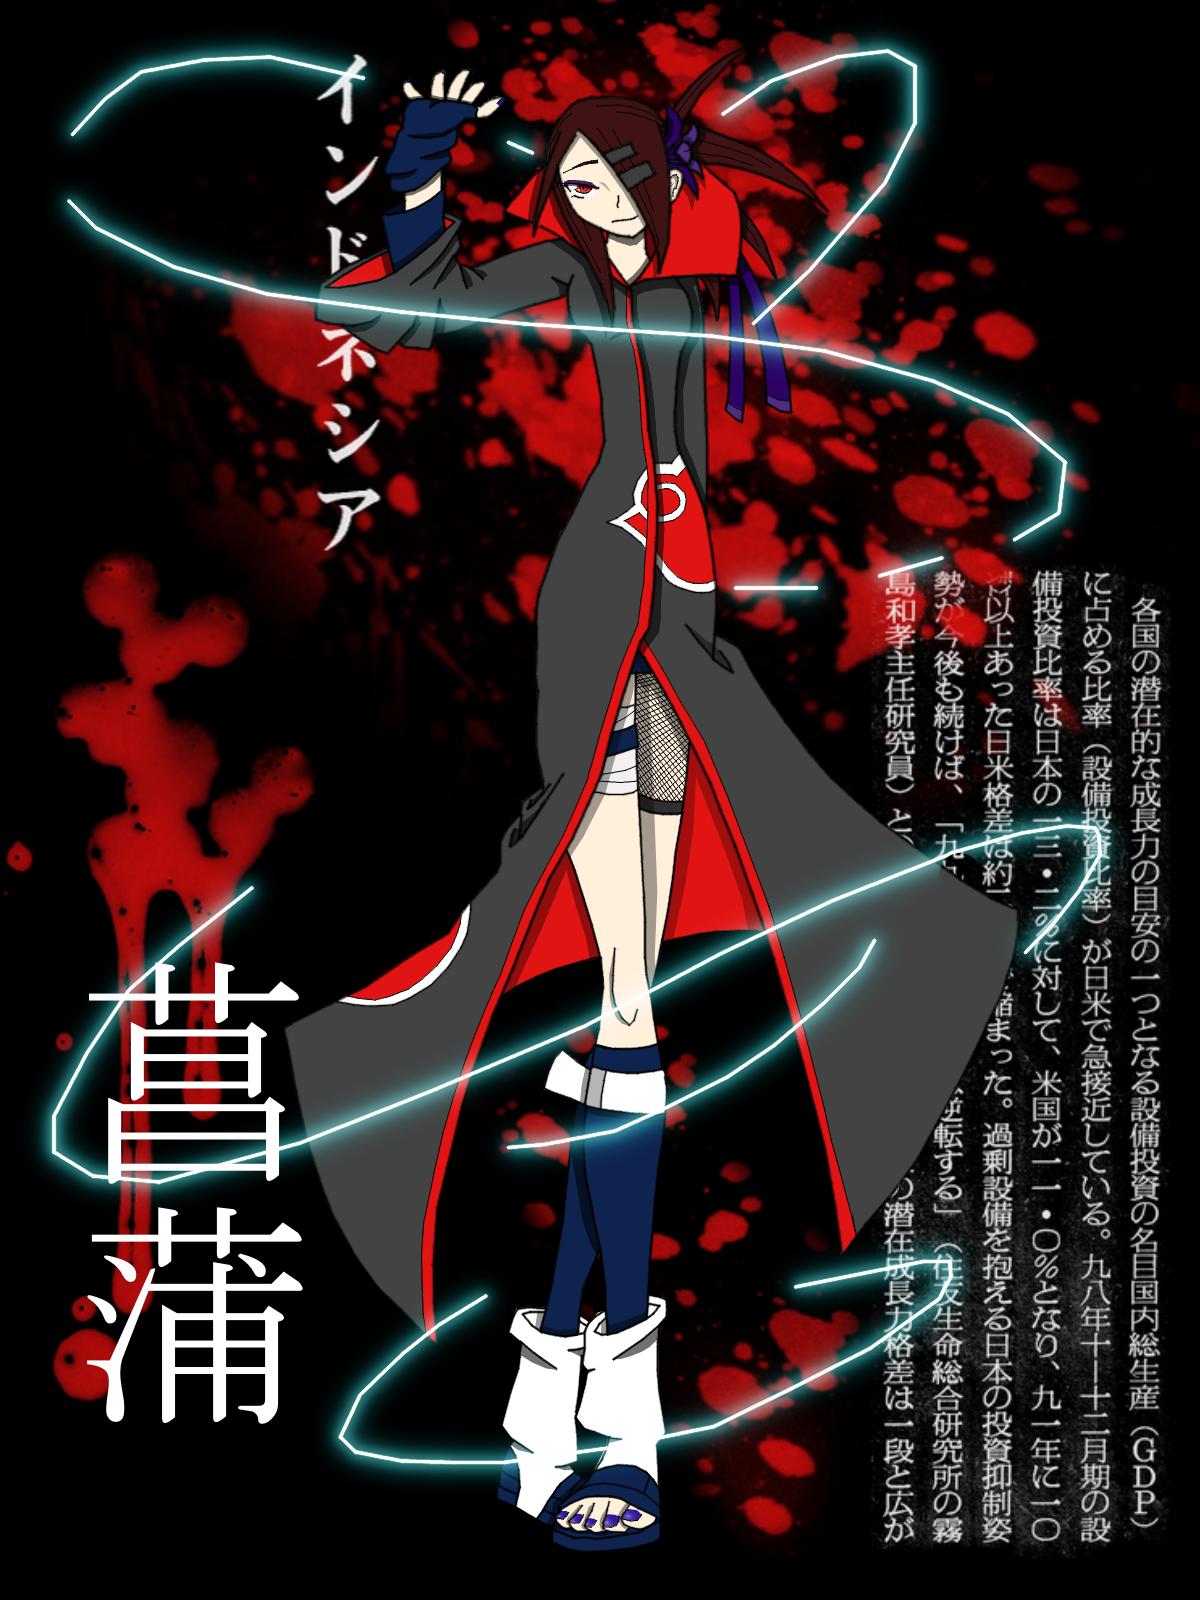 Akatsuki Fanfiction Character by animeaddict519 on DeviantArt